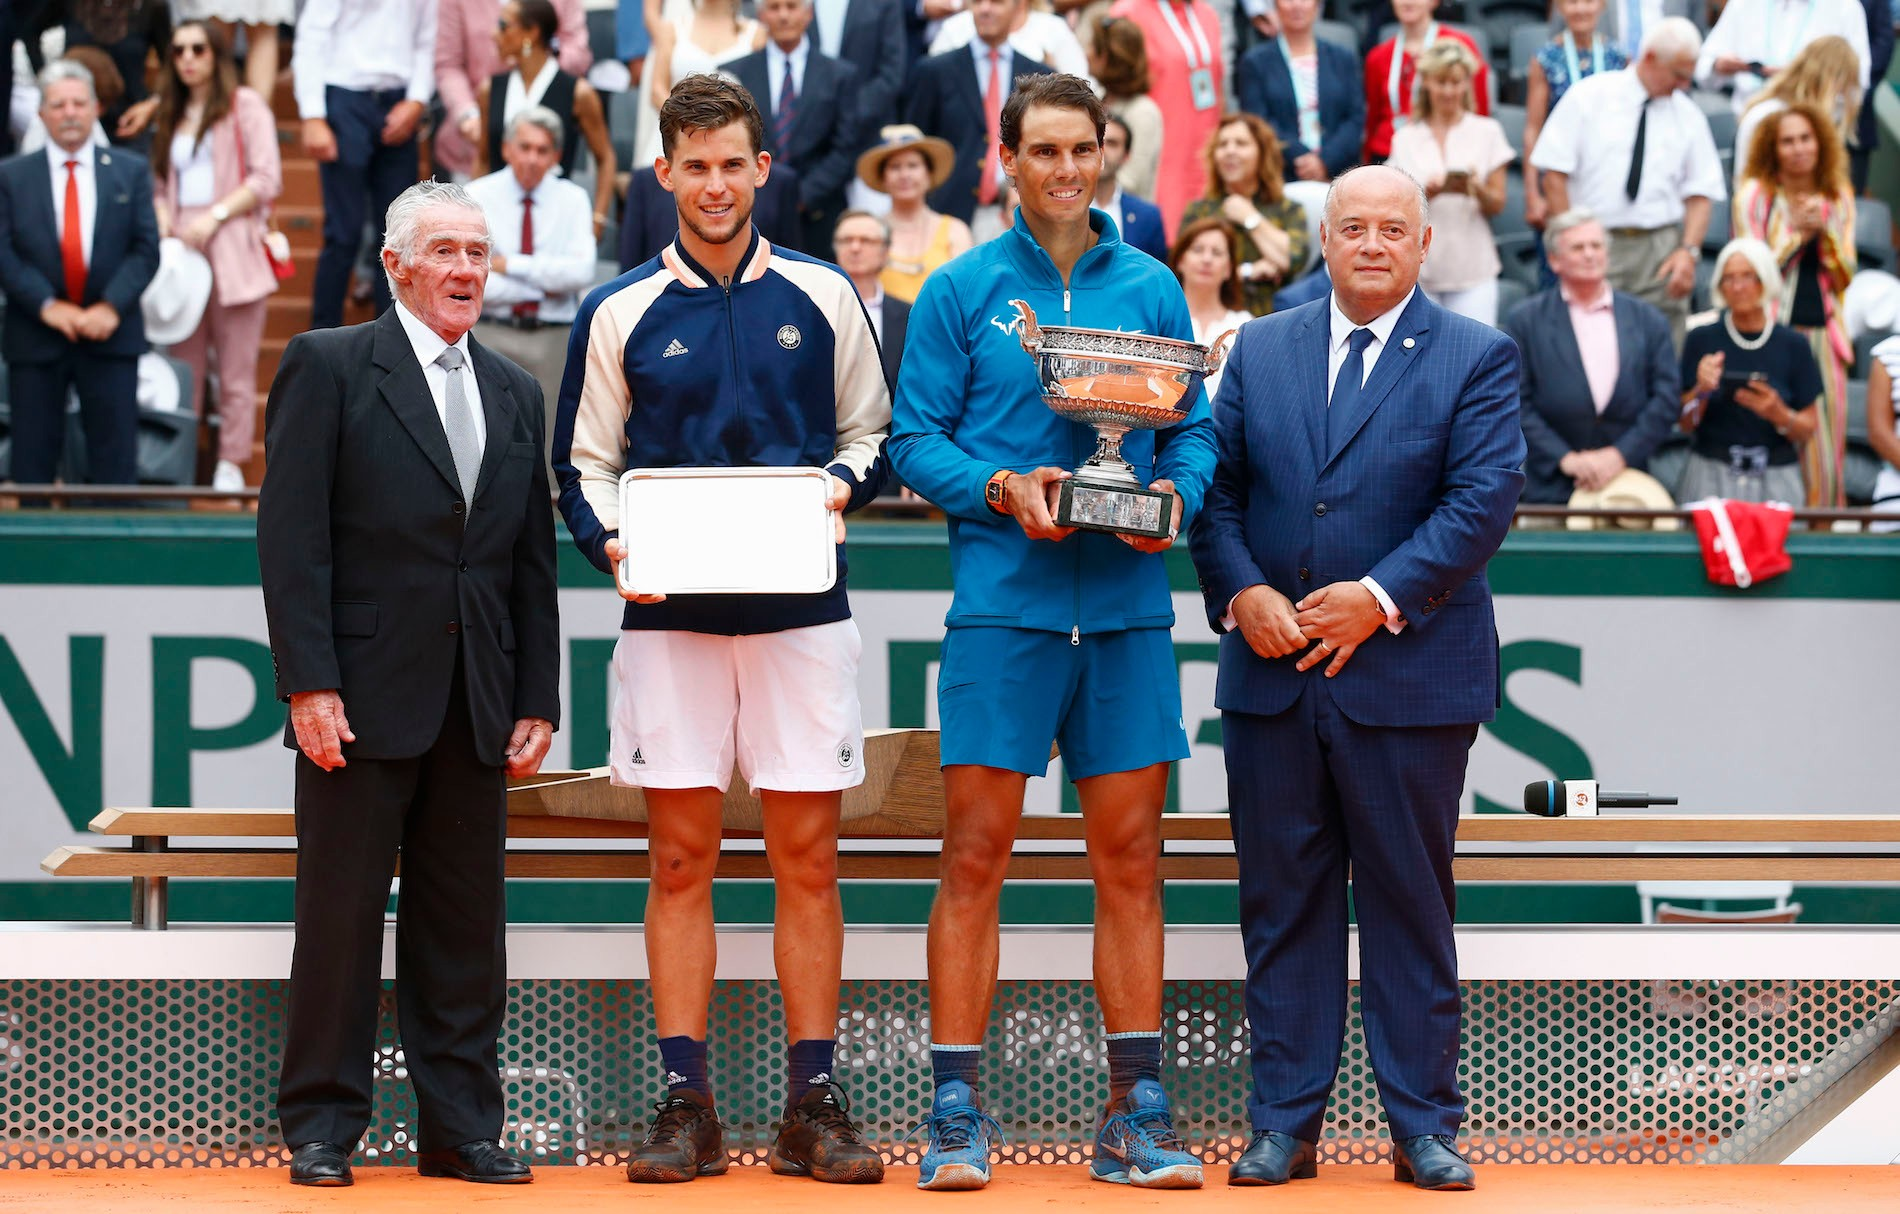 Ken Rosewall, Dominic Thiem, Rafael Nadal, Bernard Giudicelli, Roland-Garros 2019